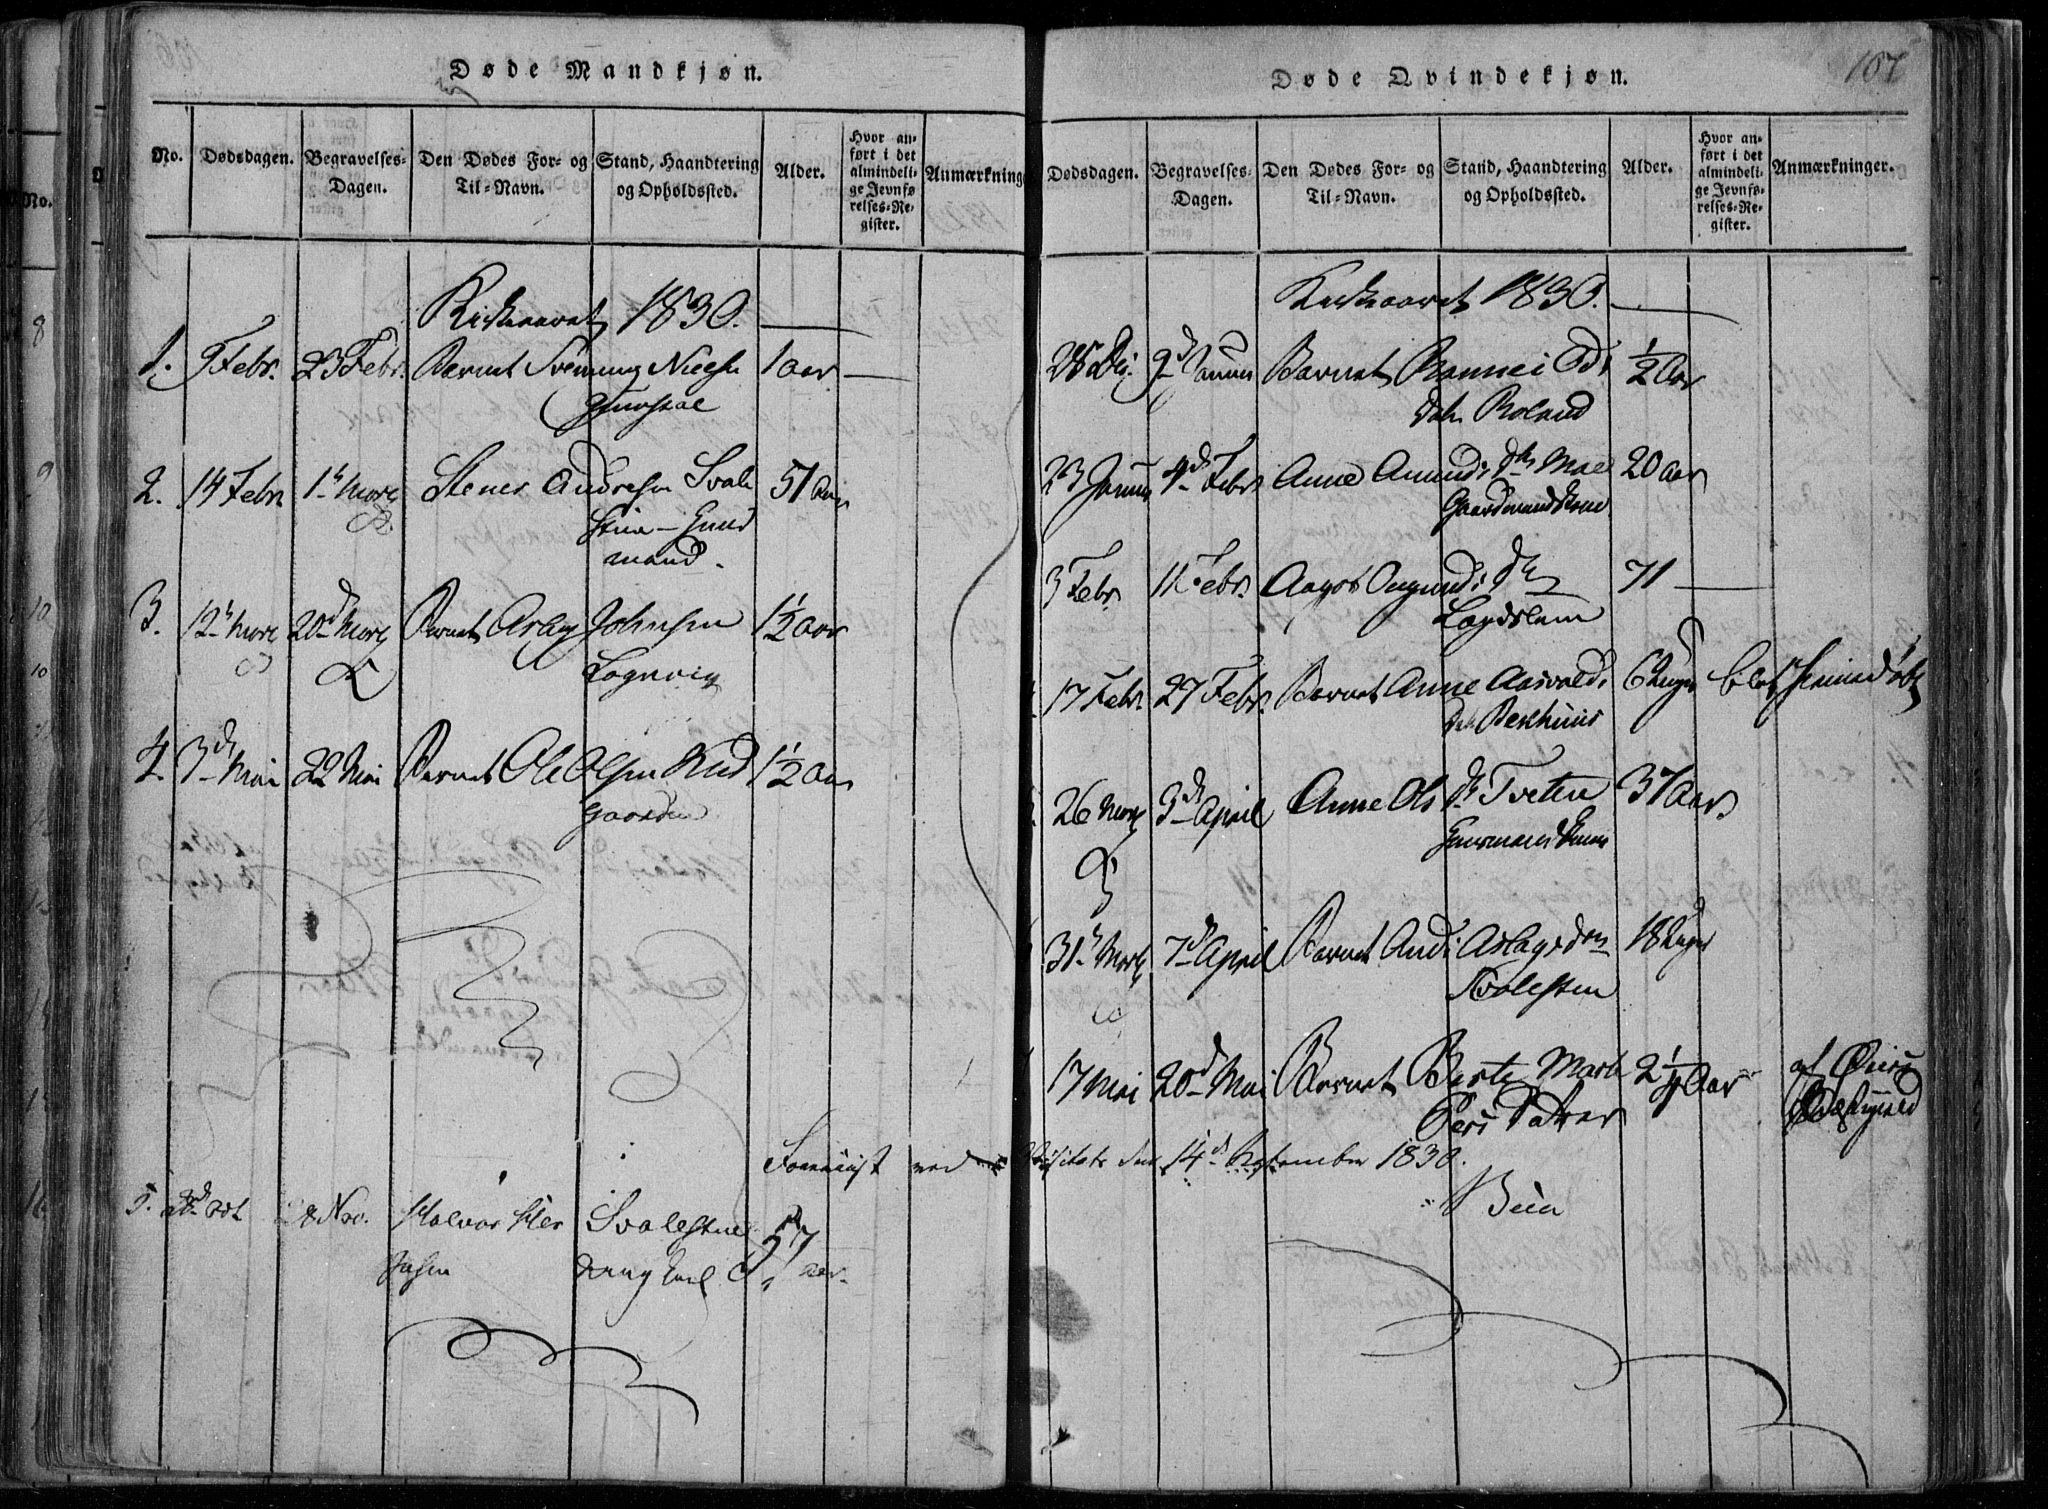 SAKO, Rauland kirkebøker, F/Fa/L0001: Ministerialbok nr. 1, 1814-1859, s. 107